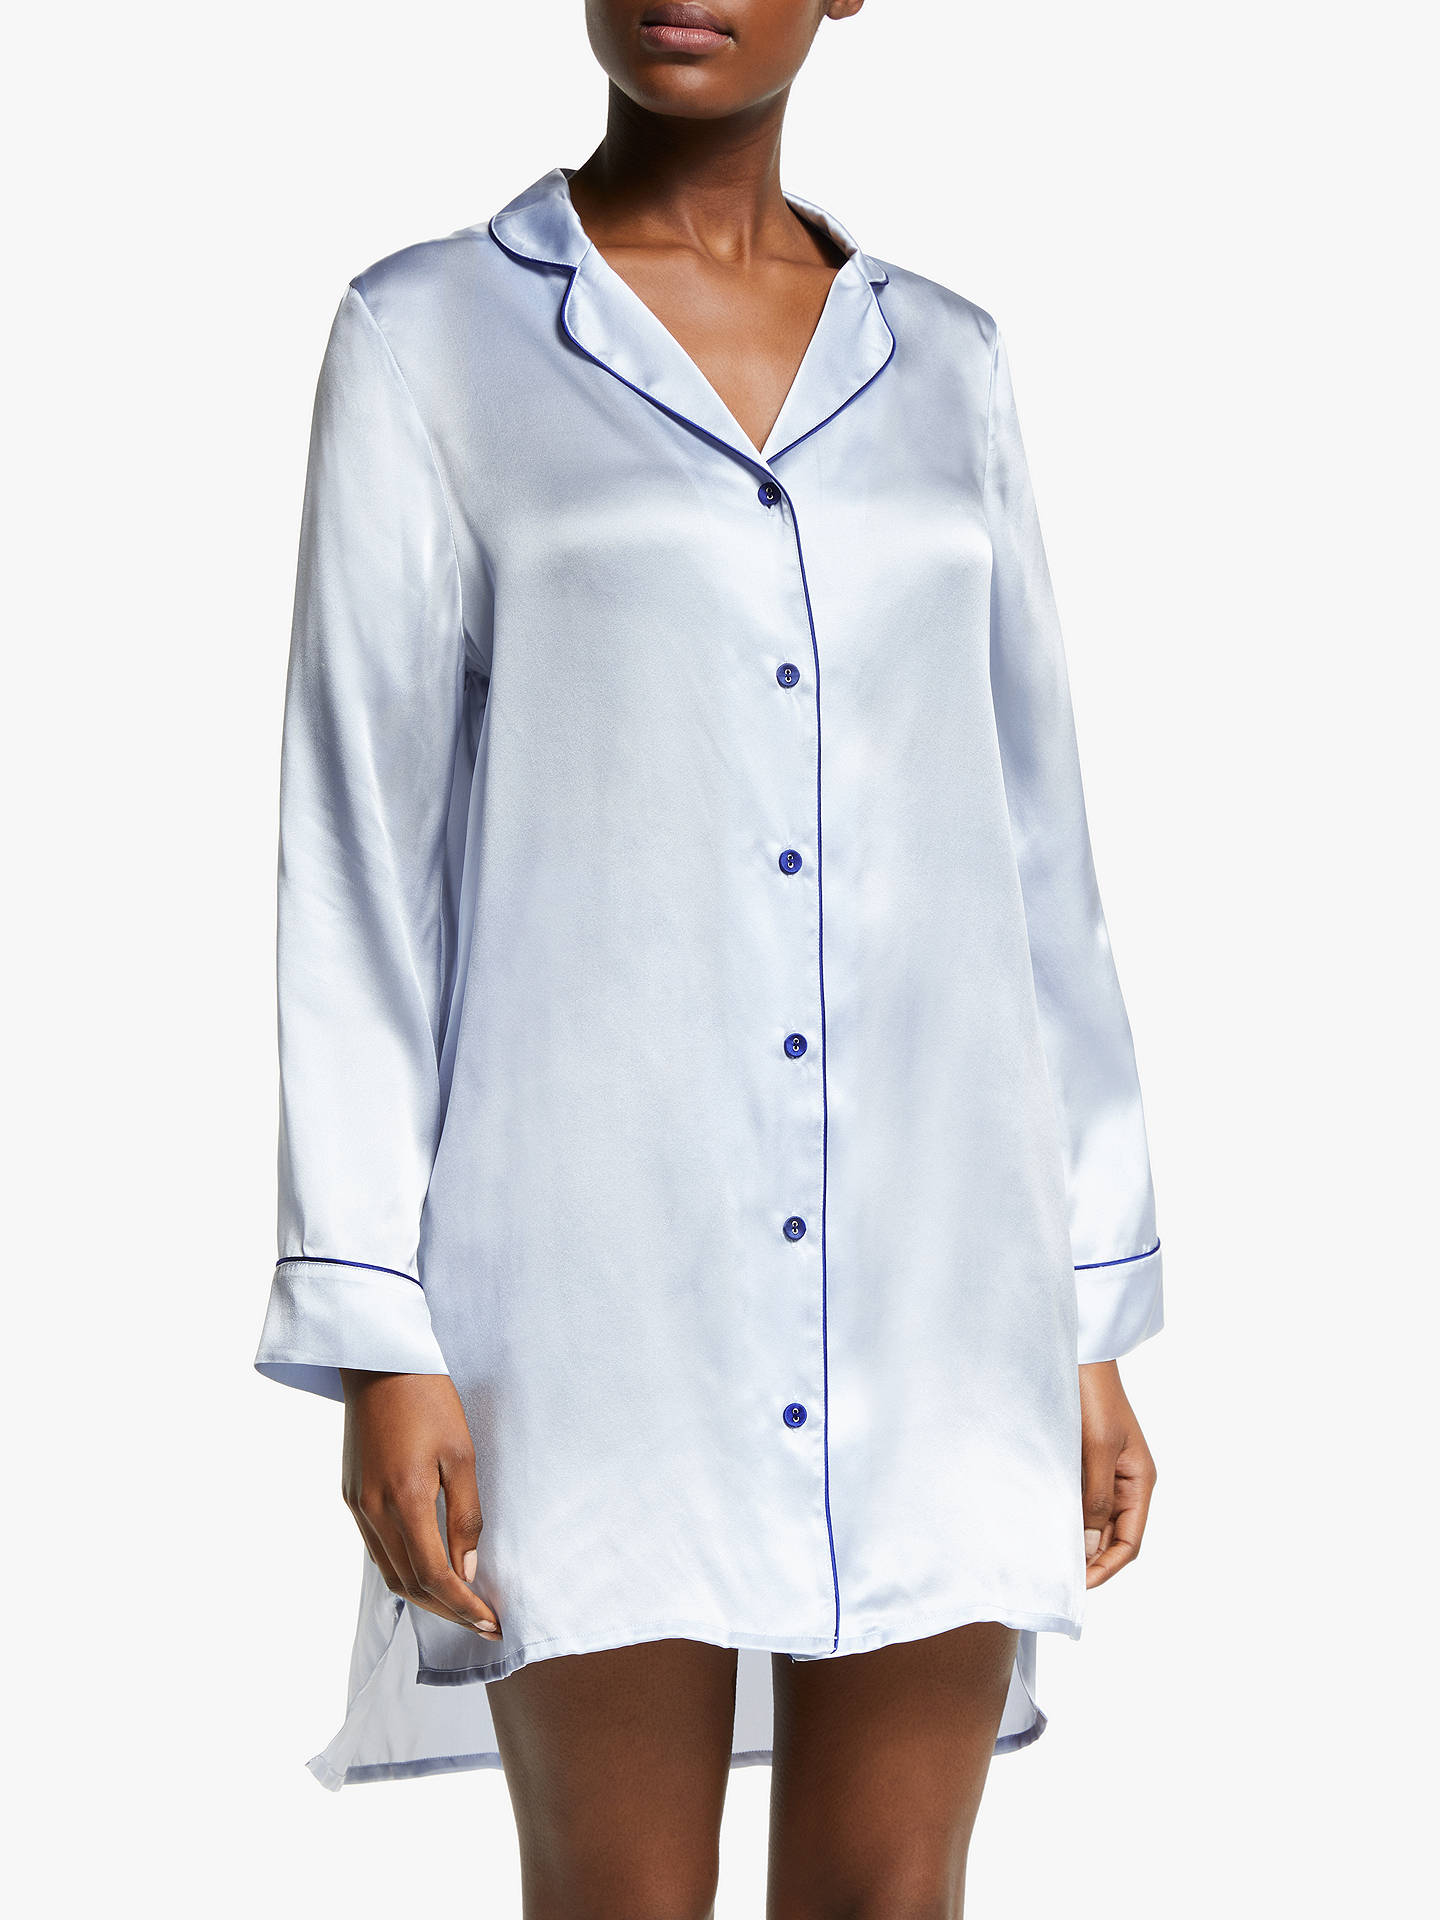 94ad36683c BuyJohn Lewis   Partners Silk Piped Nightshirt